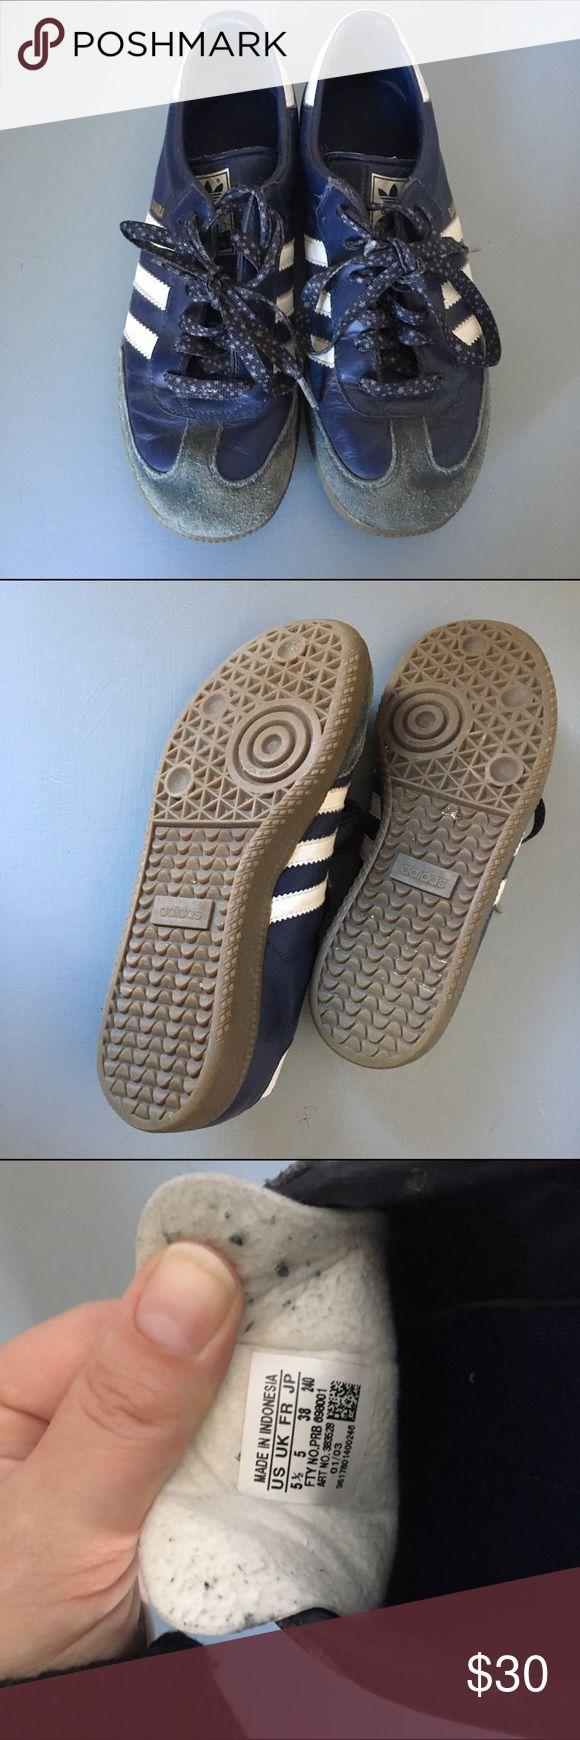 adidas samba blue suede